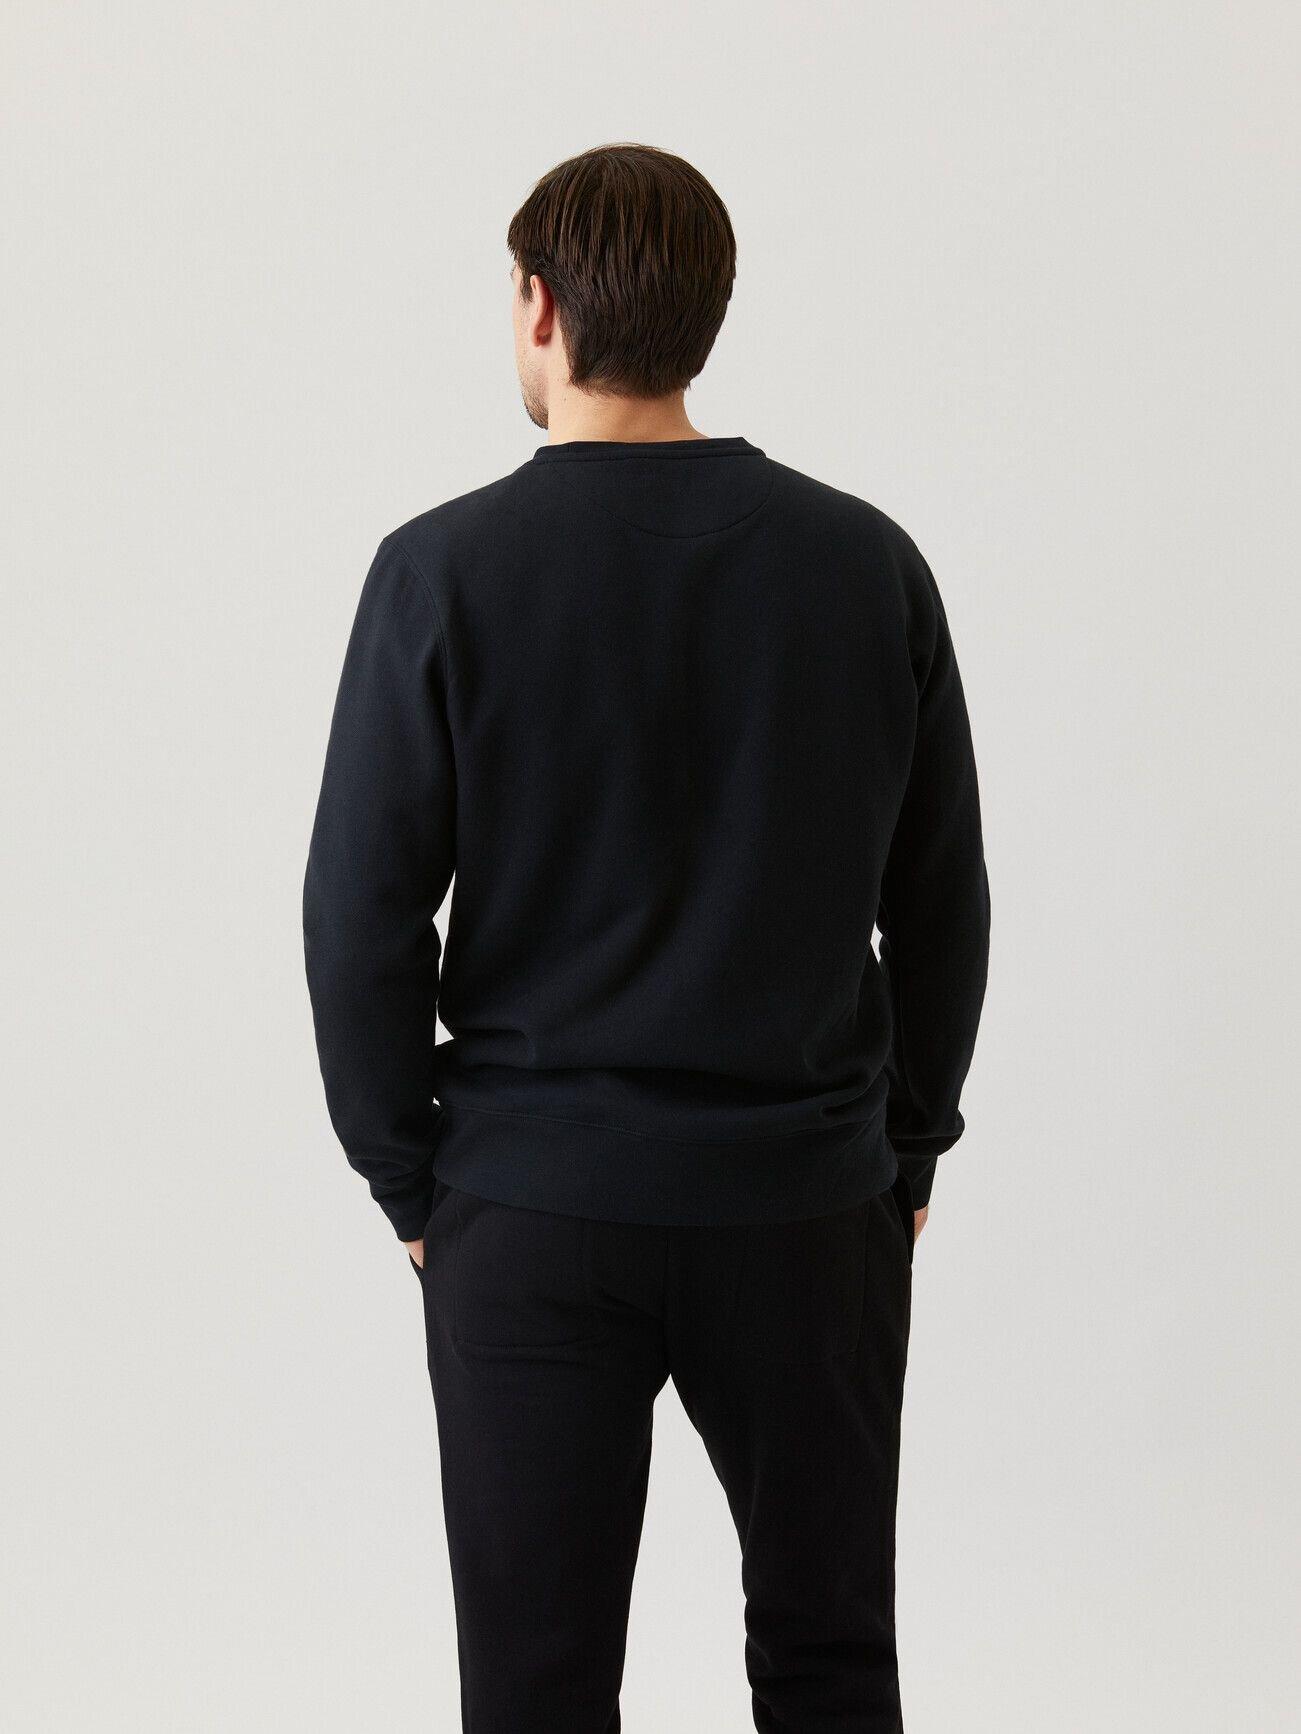 Centre Crew Sweatshirt - Black Beauty